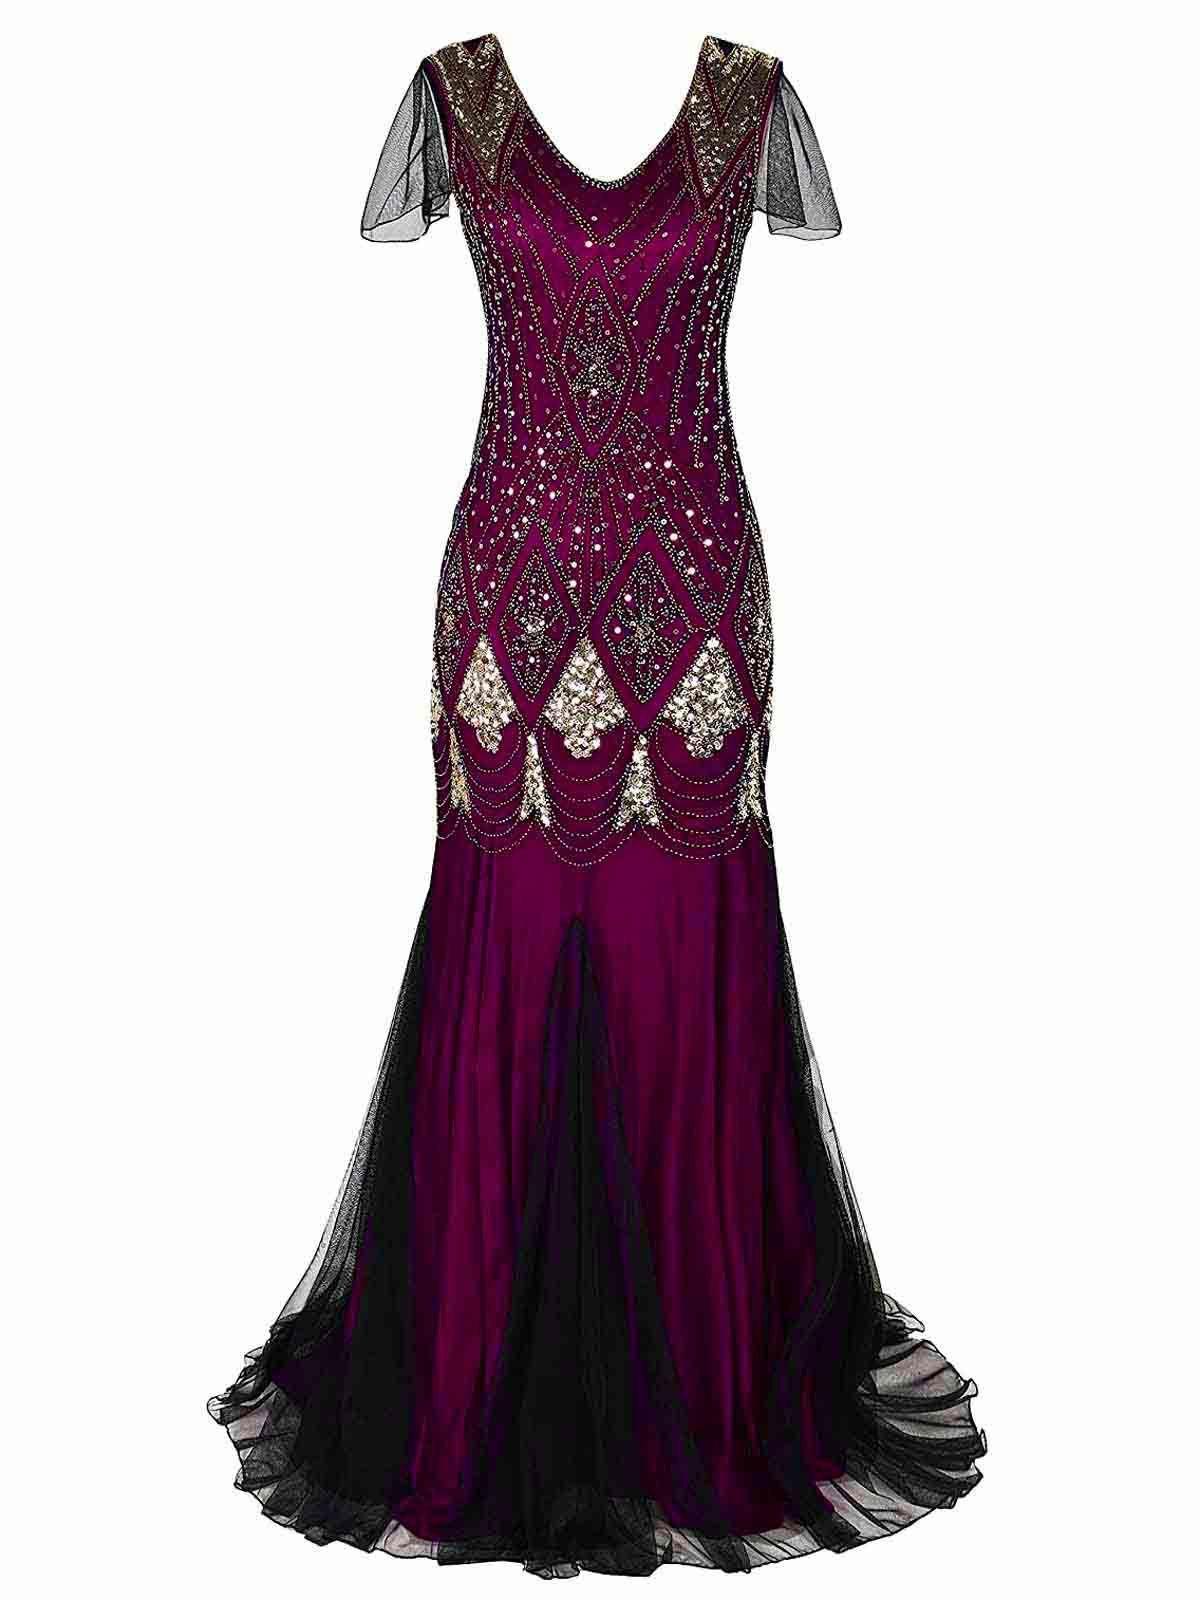 1920s Sequined Maxi Flapper Dress Women S Evening Dresses 1920s Dress Dresses [ 1600 x 1200 Pixel ]